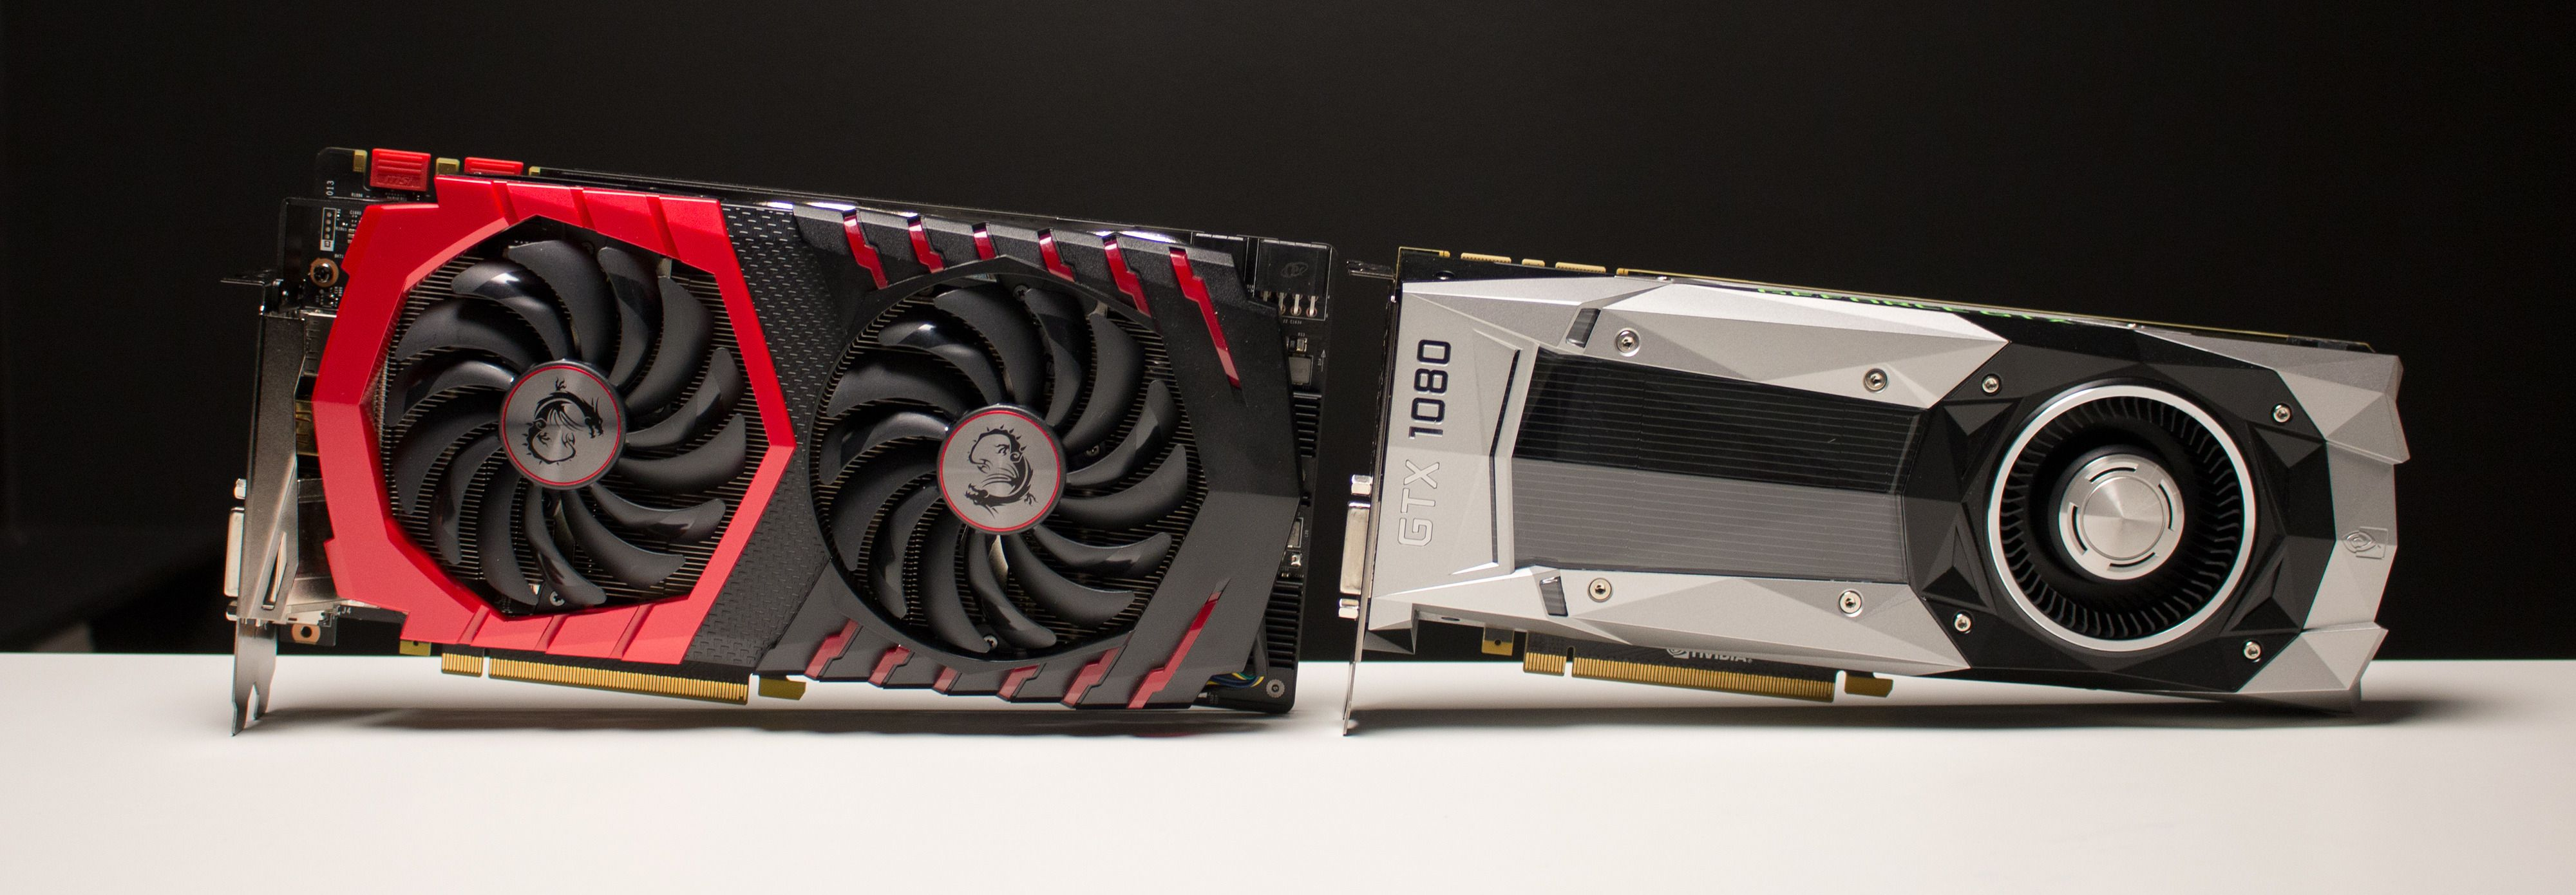 MSI GTX 1080 Gaming X møter Nvidia GTX 1080 FE.